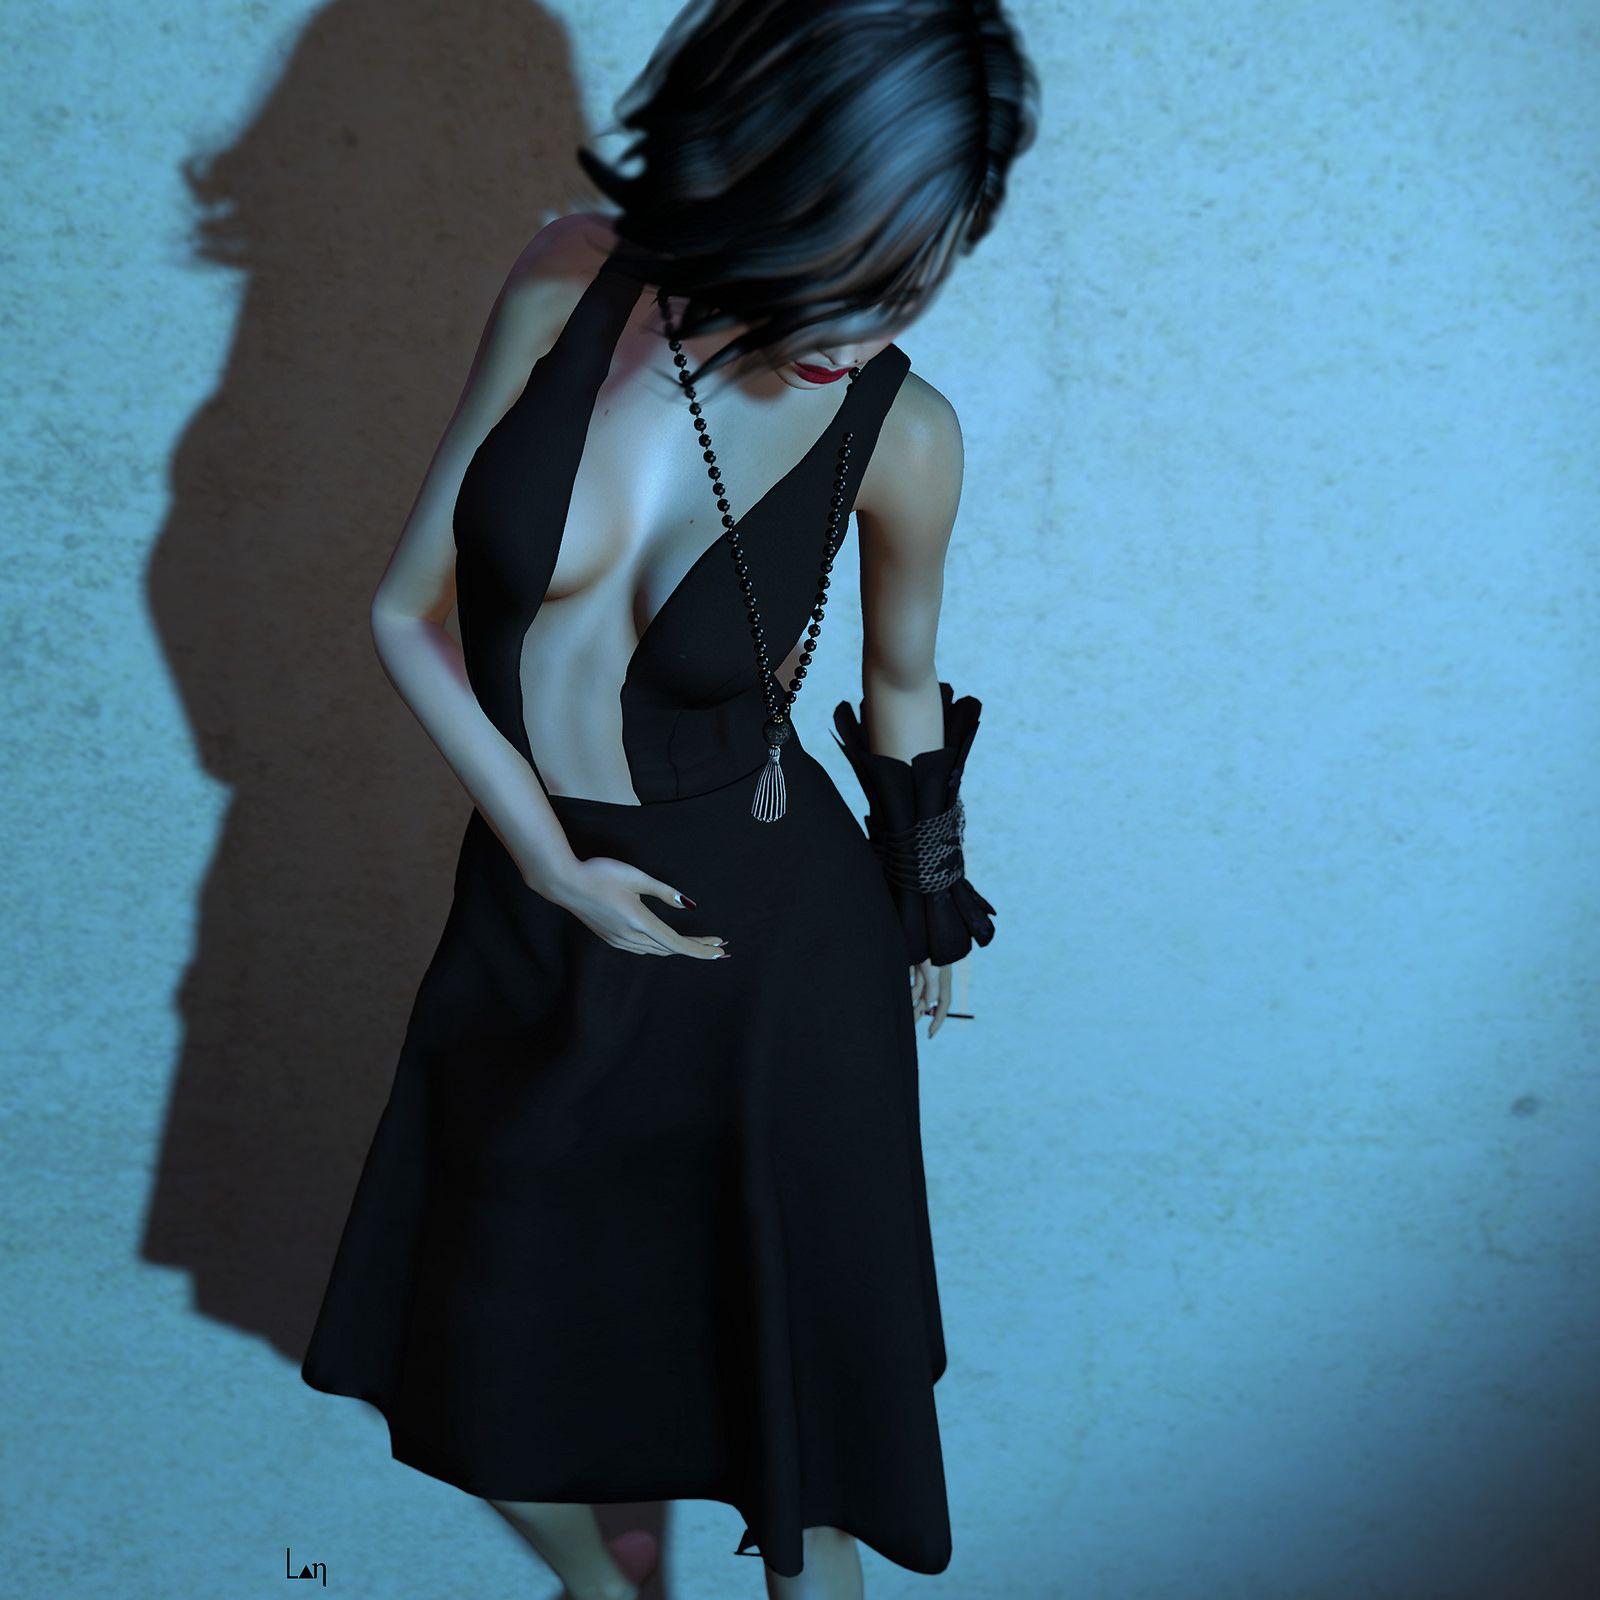 https://flic.kr/p/BR54Xa | · | Mina: Stella Hair @Très Chic [sYs]: La Petite Robe Noire @Très Chic [sYs]: Corelia Bracelet @Très Chic Amitie: Lazy 01 Pose @Très Chic Minimal: Andrea Necklace